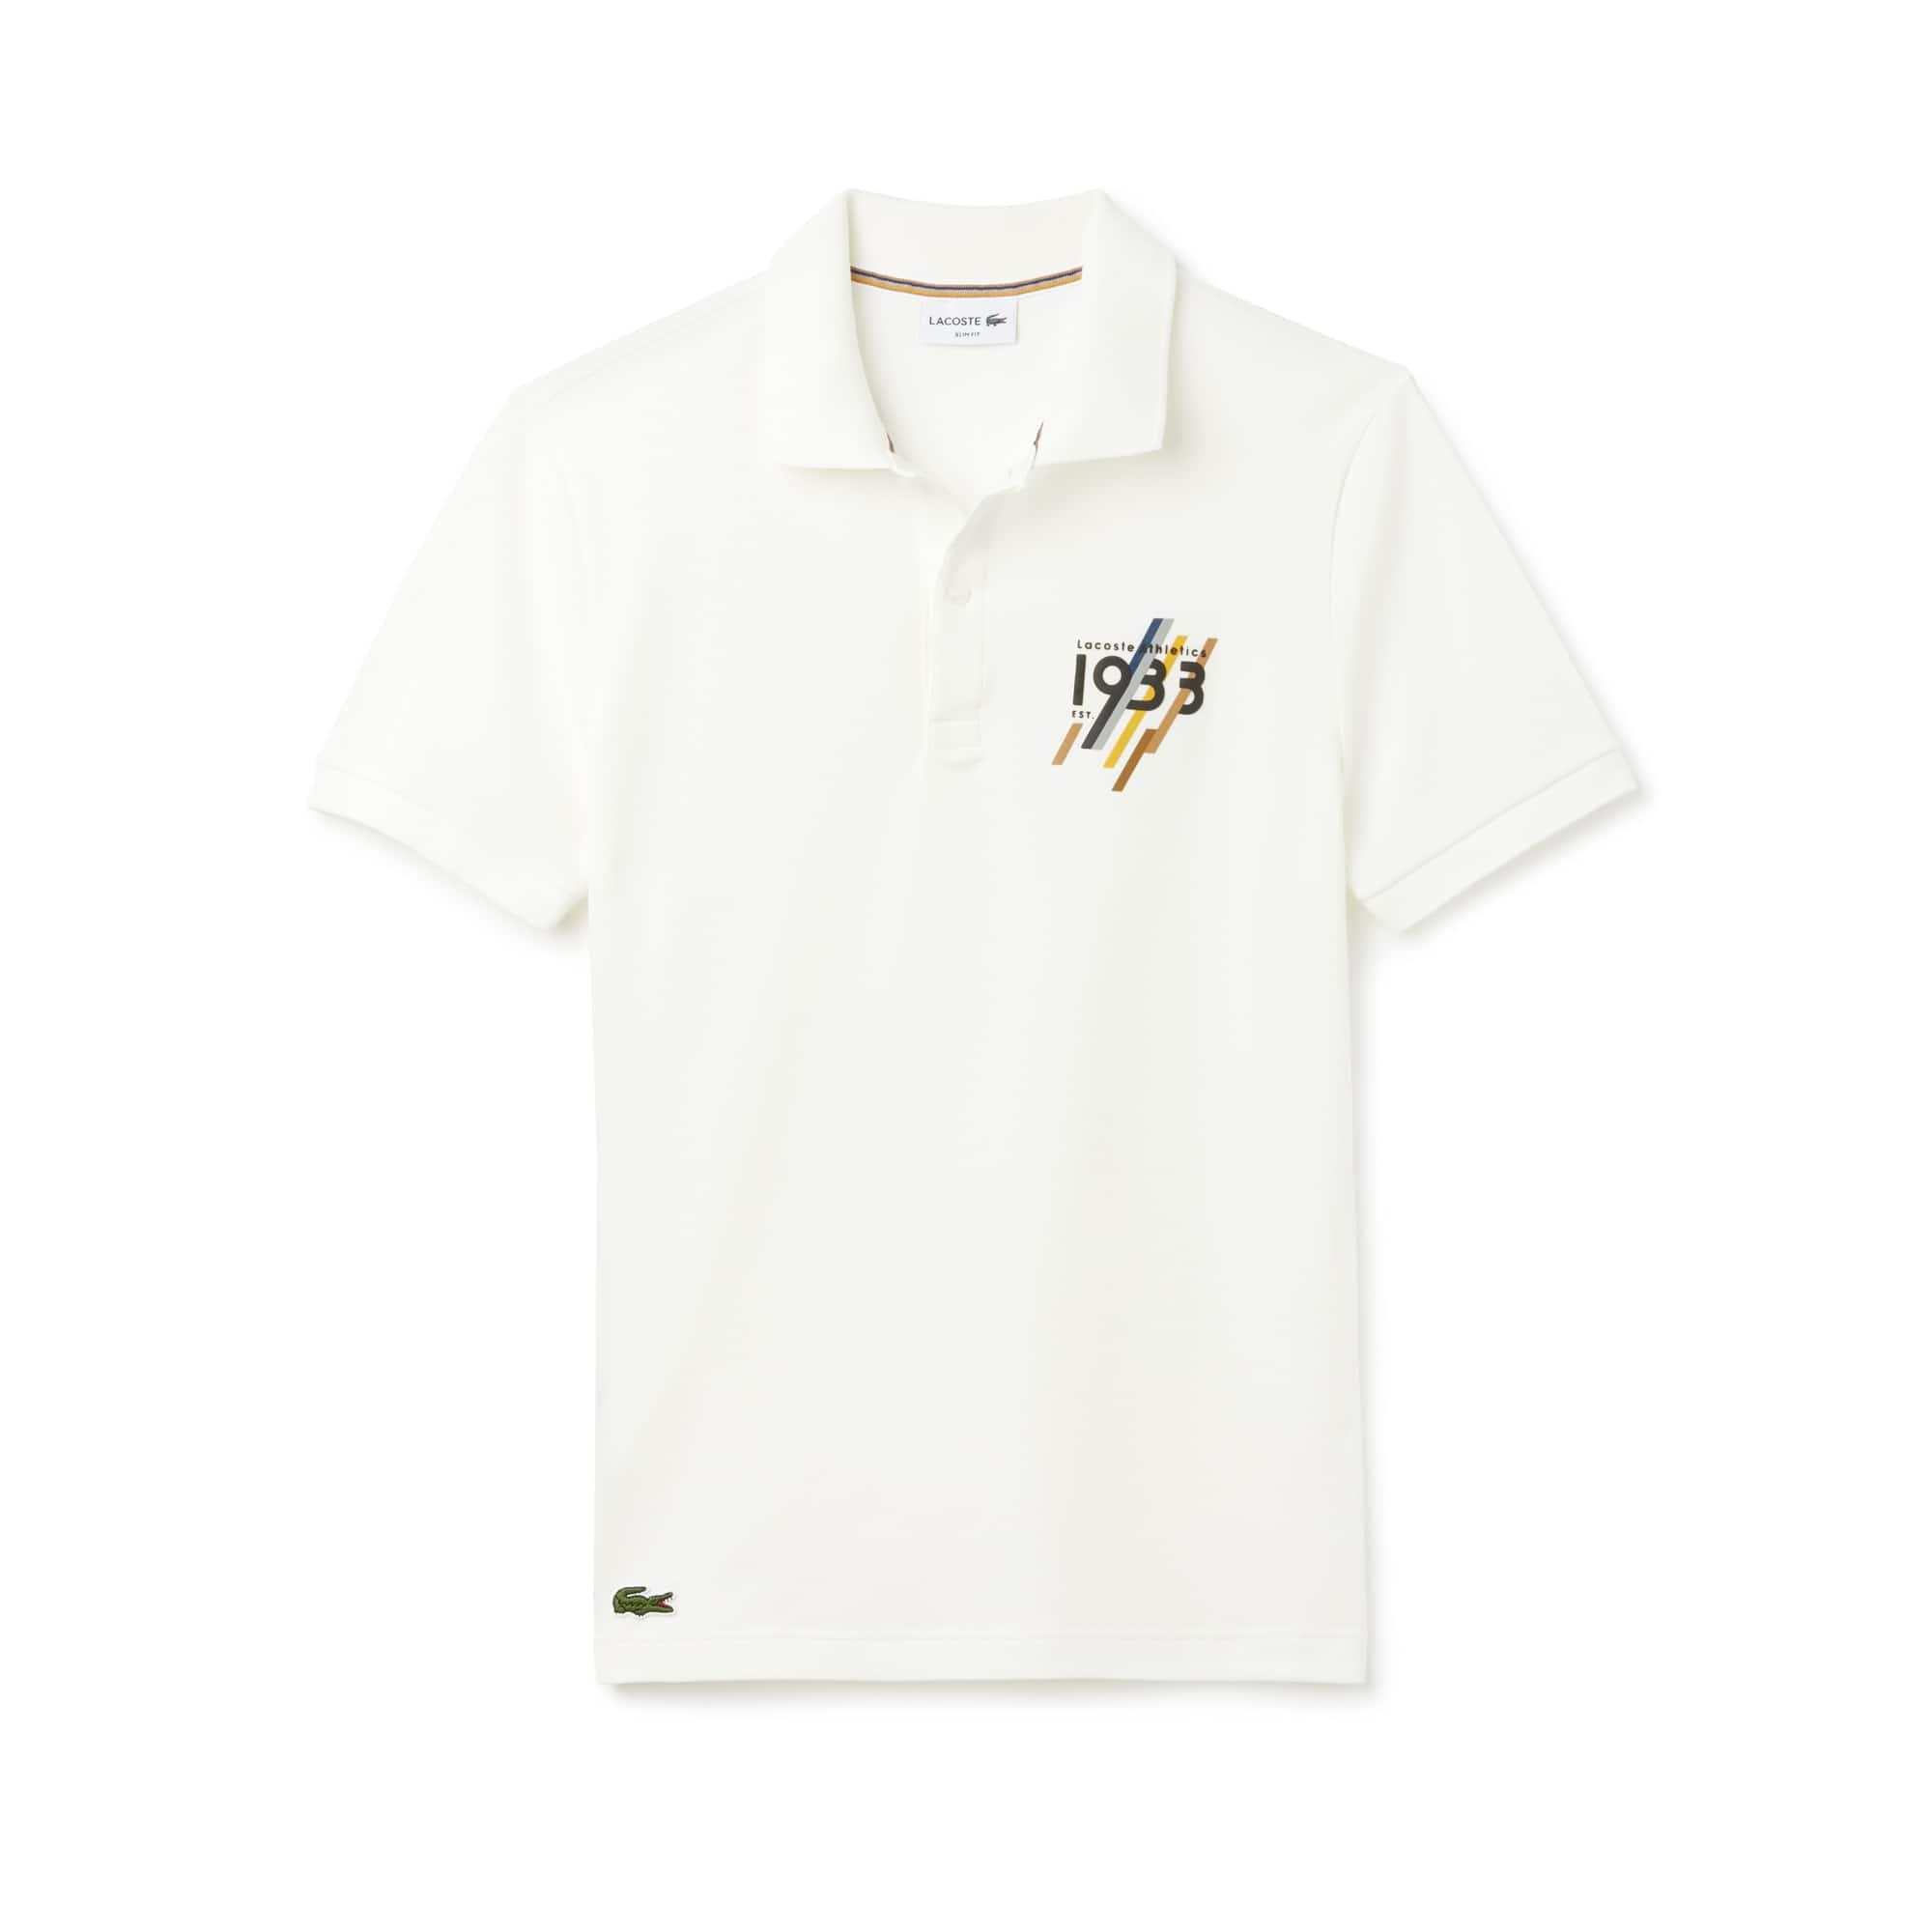 Herren LACOSTE Slim Fit Herren-Poloshirt mit 1933-Schriftzug